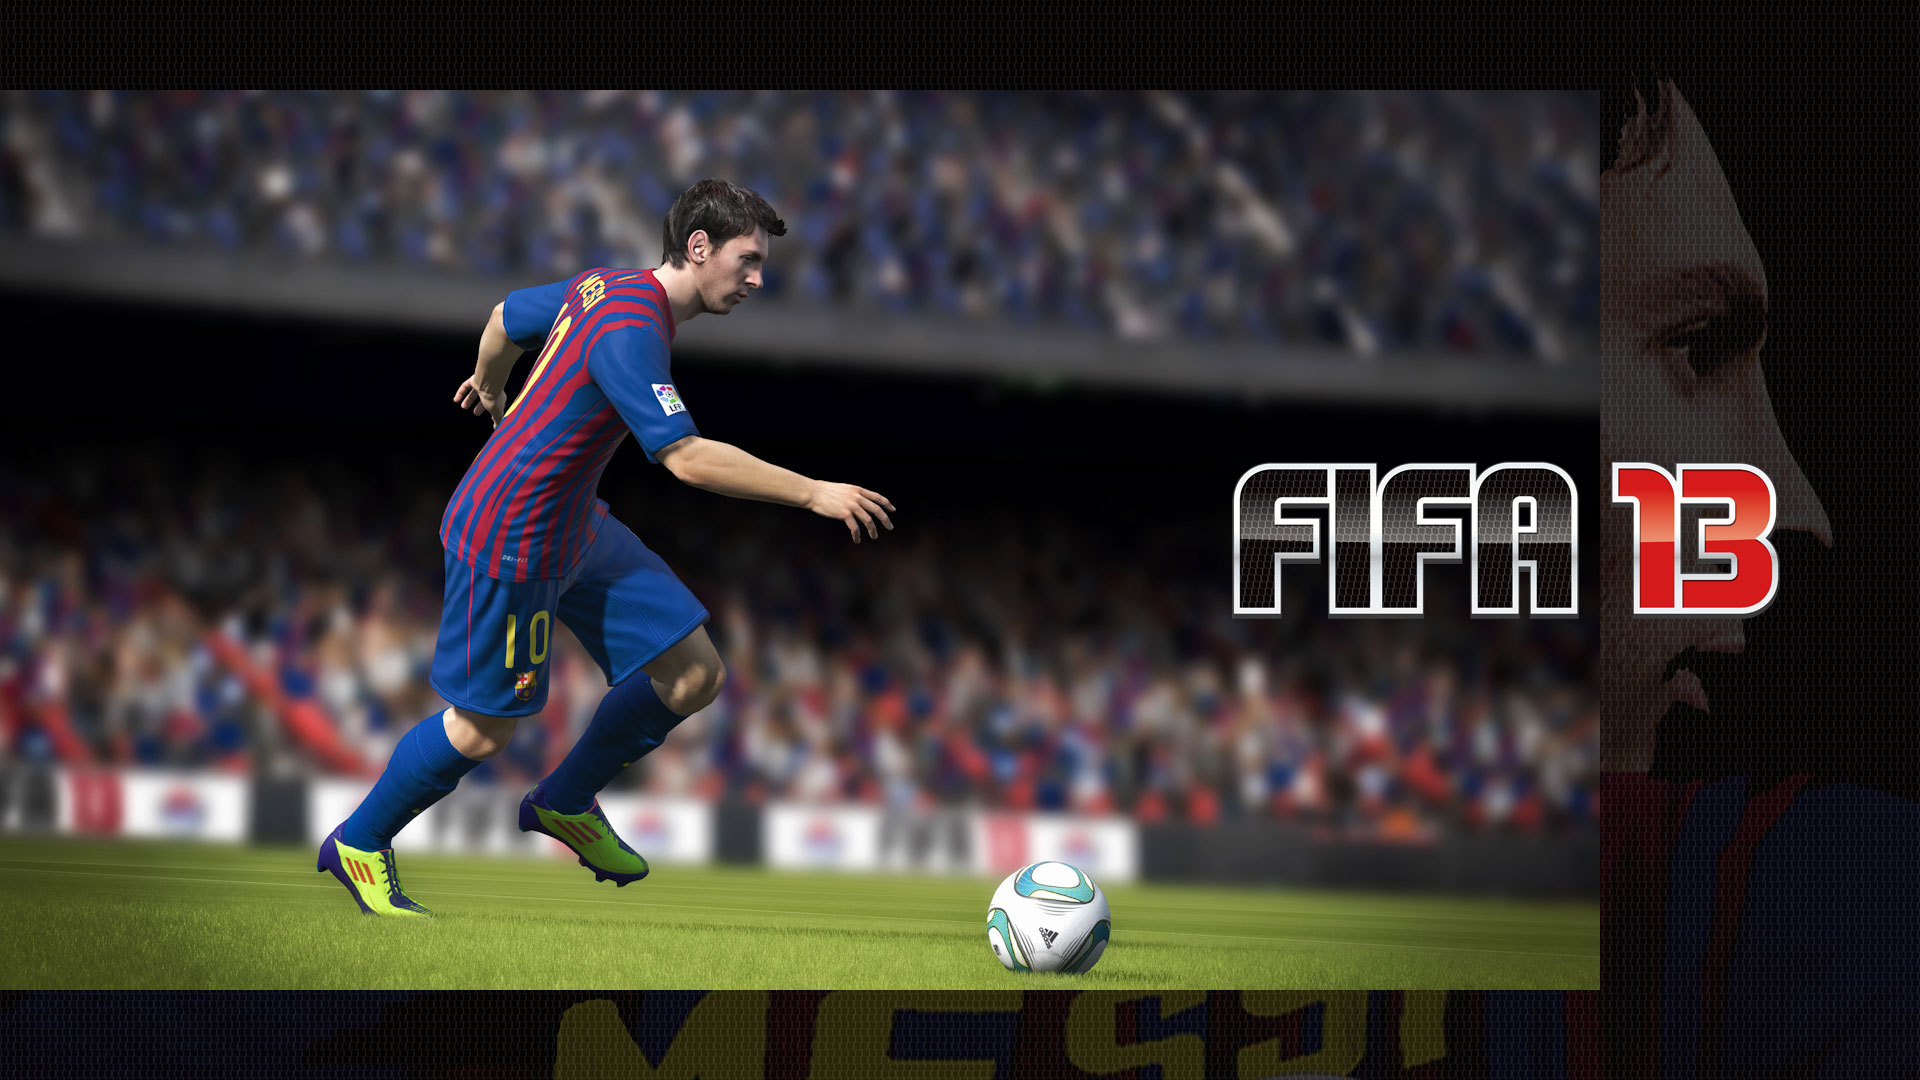 47+] FIFA Wallpapers HD on WallpaperSafari